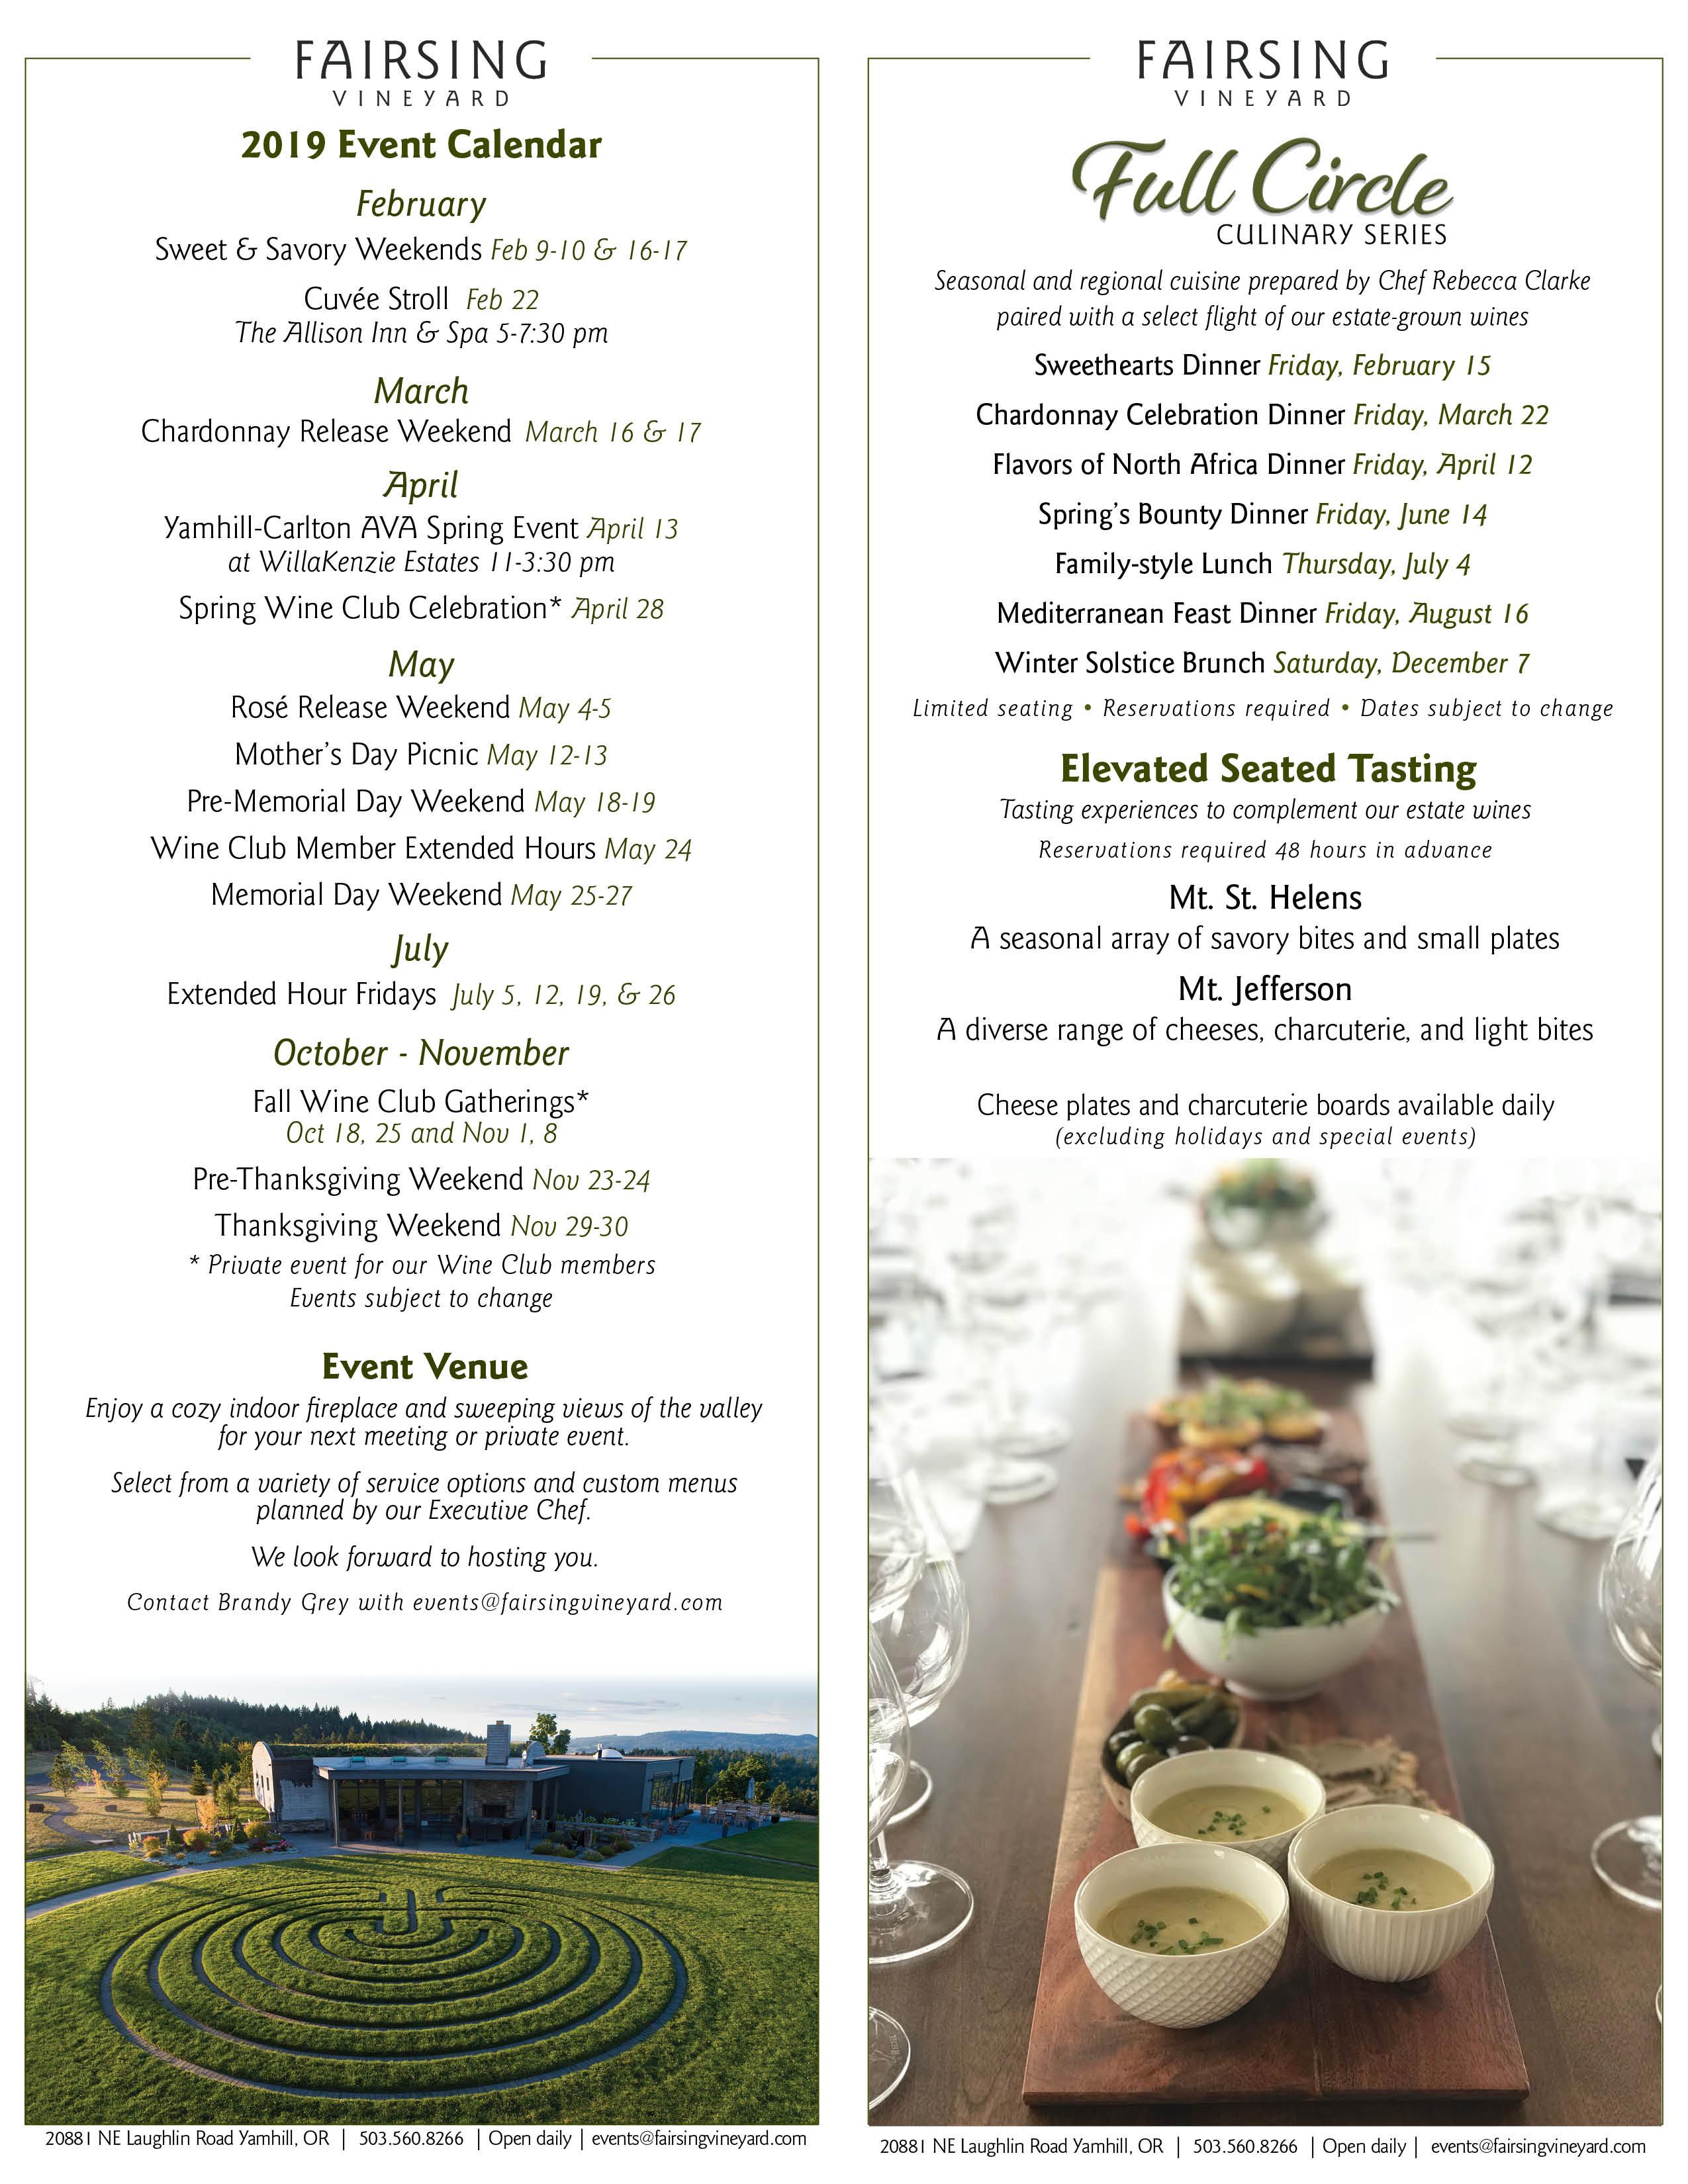 The 2019 Fairsing Vineyard Calendar of Events